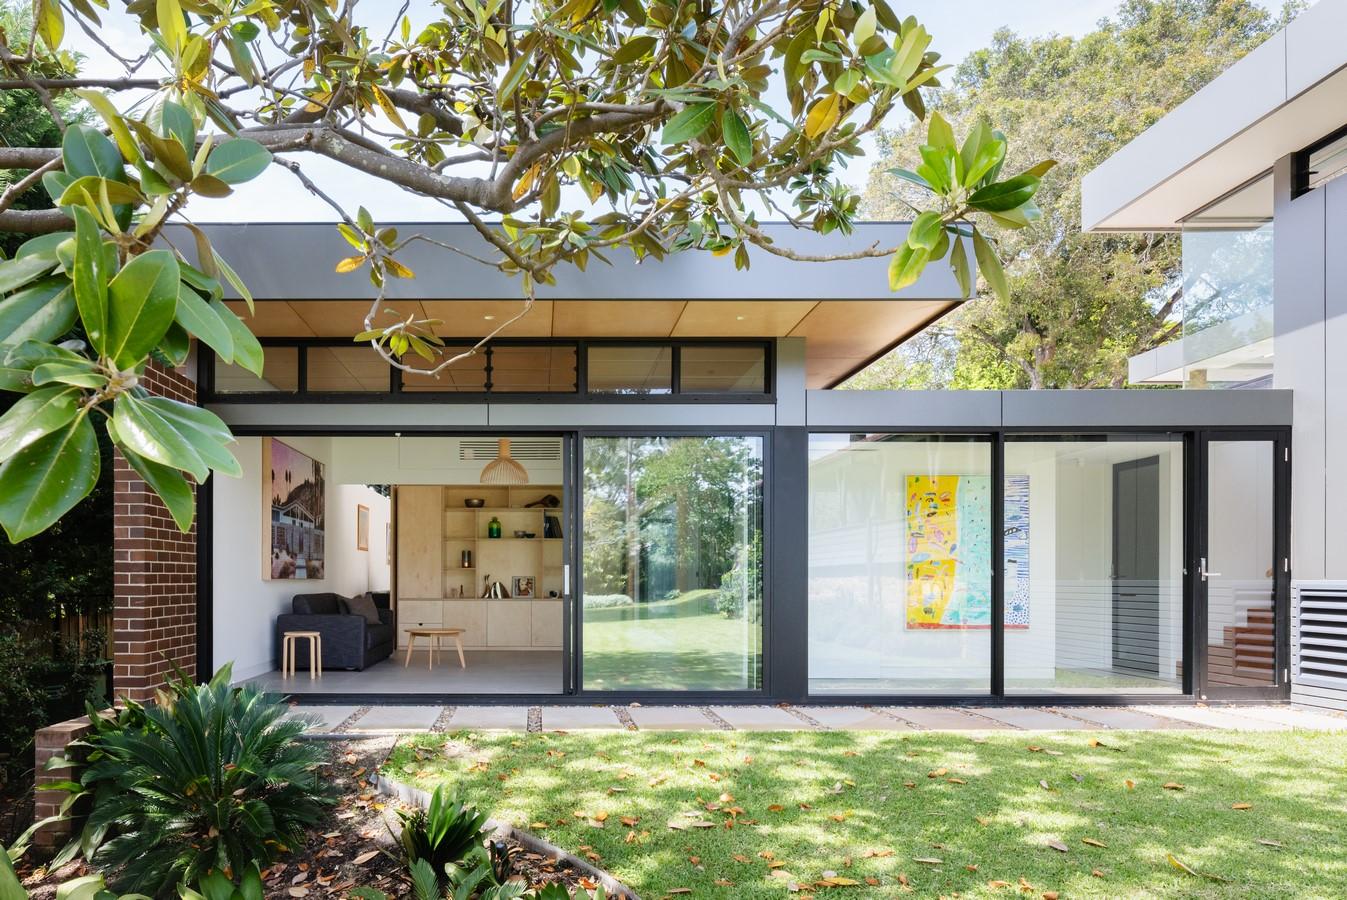 Lindfield Garden Pavilion by Utz-Sanby Architects - Sheet3